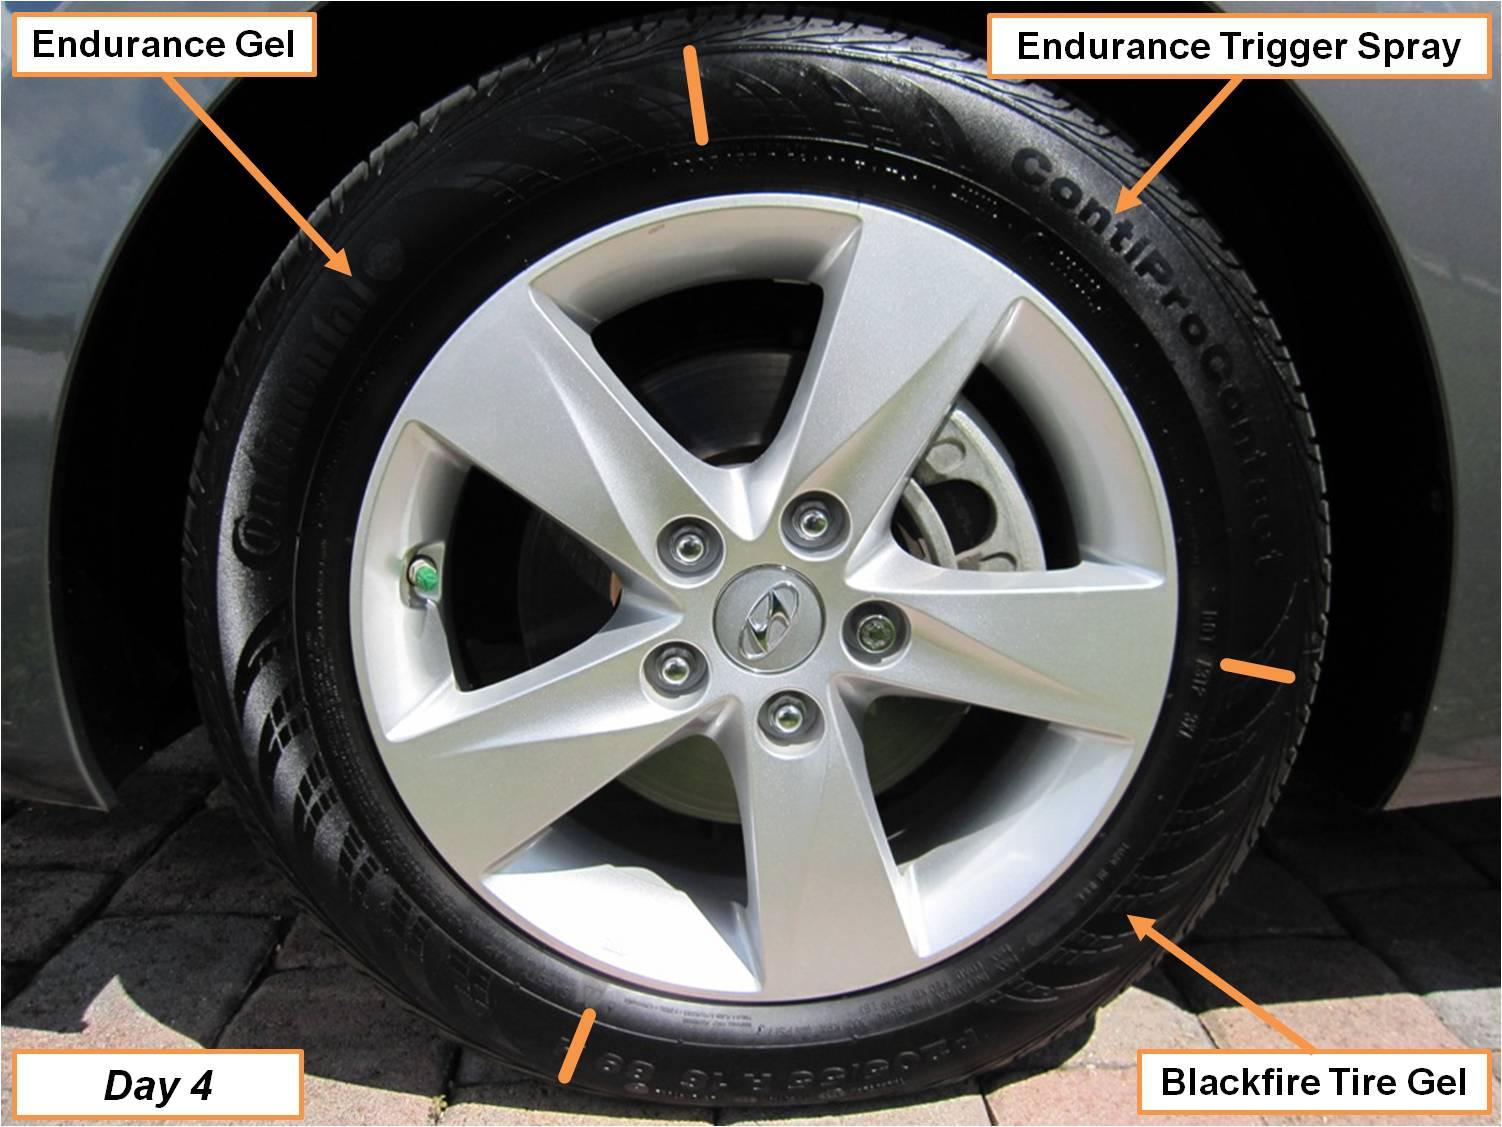 Endurance Tire Spray Meguiar's